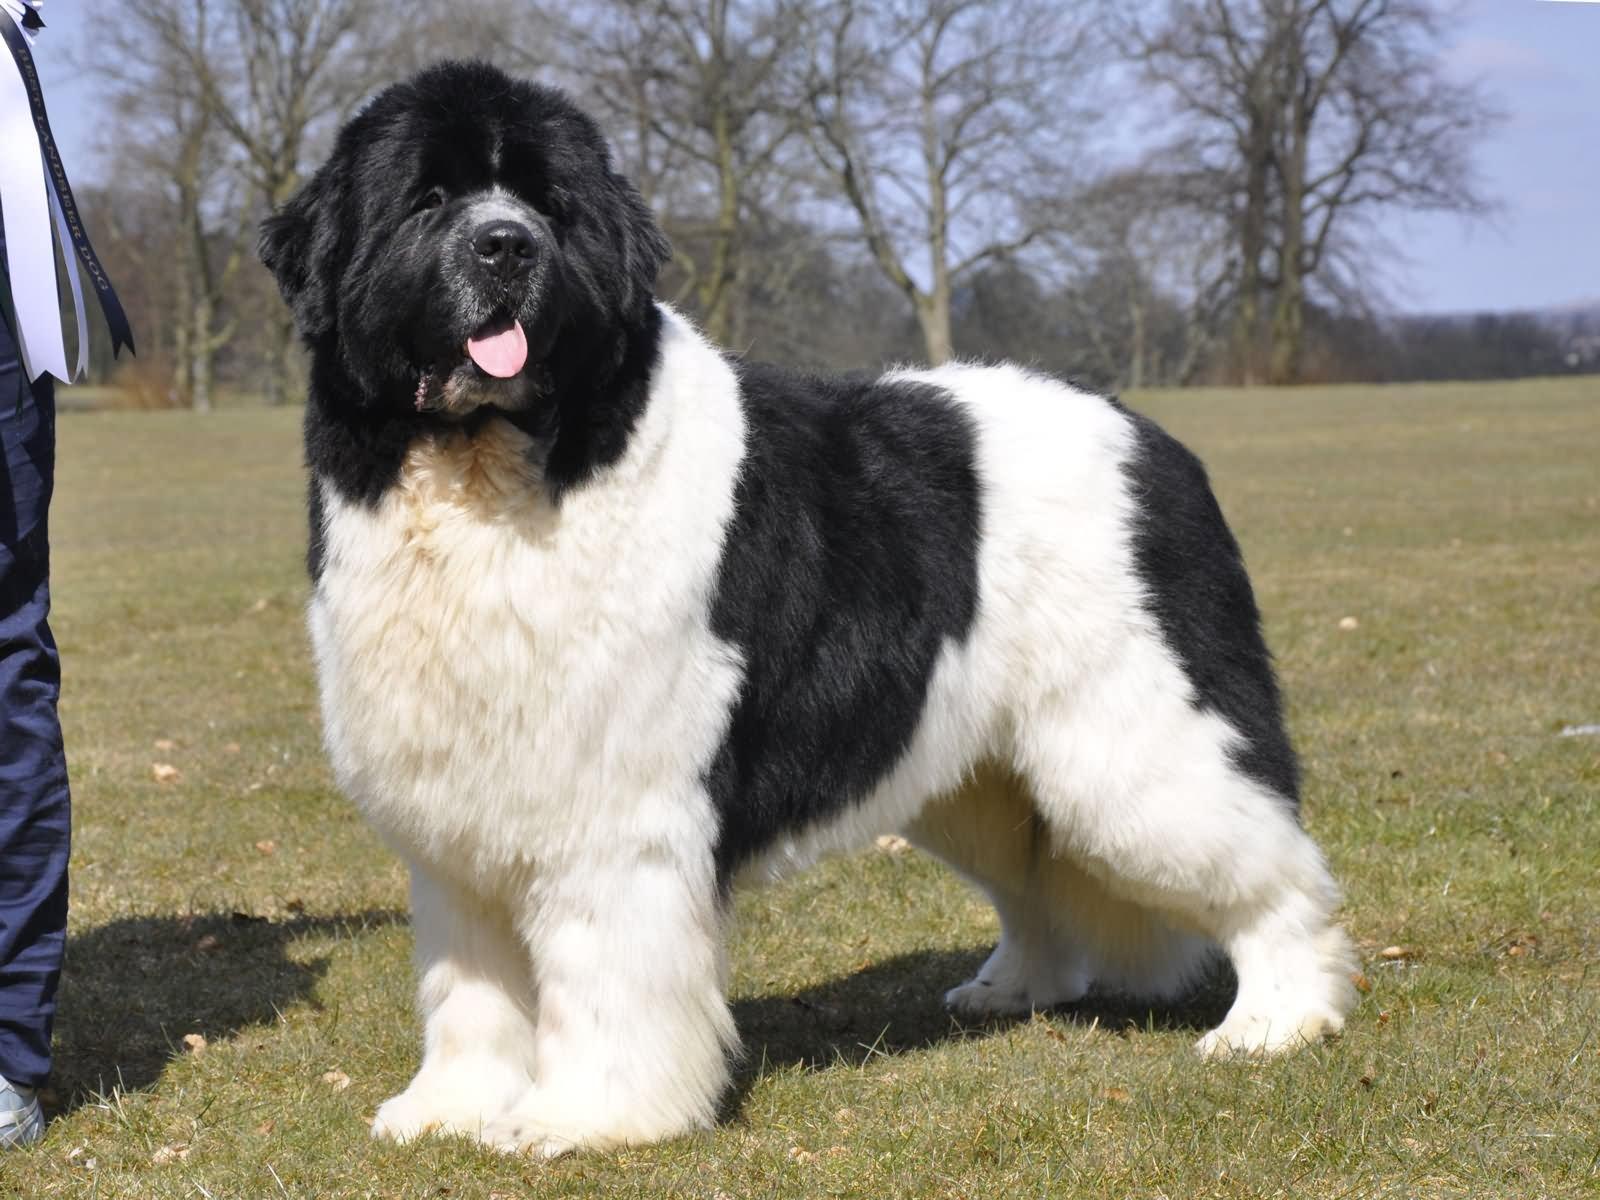 35 very beautiful newfoundland dog pictures - Black And White Newfoundland Dog